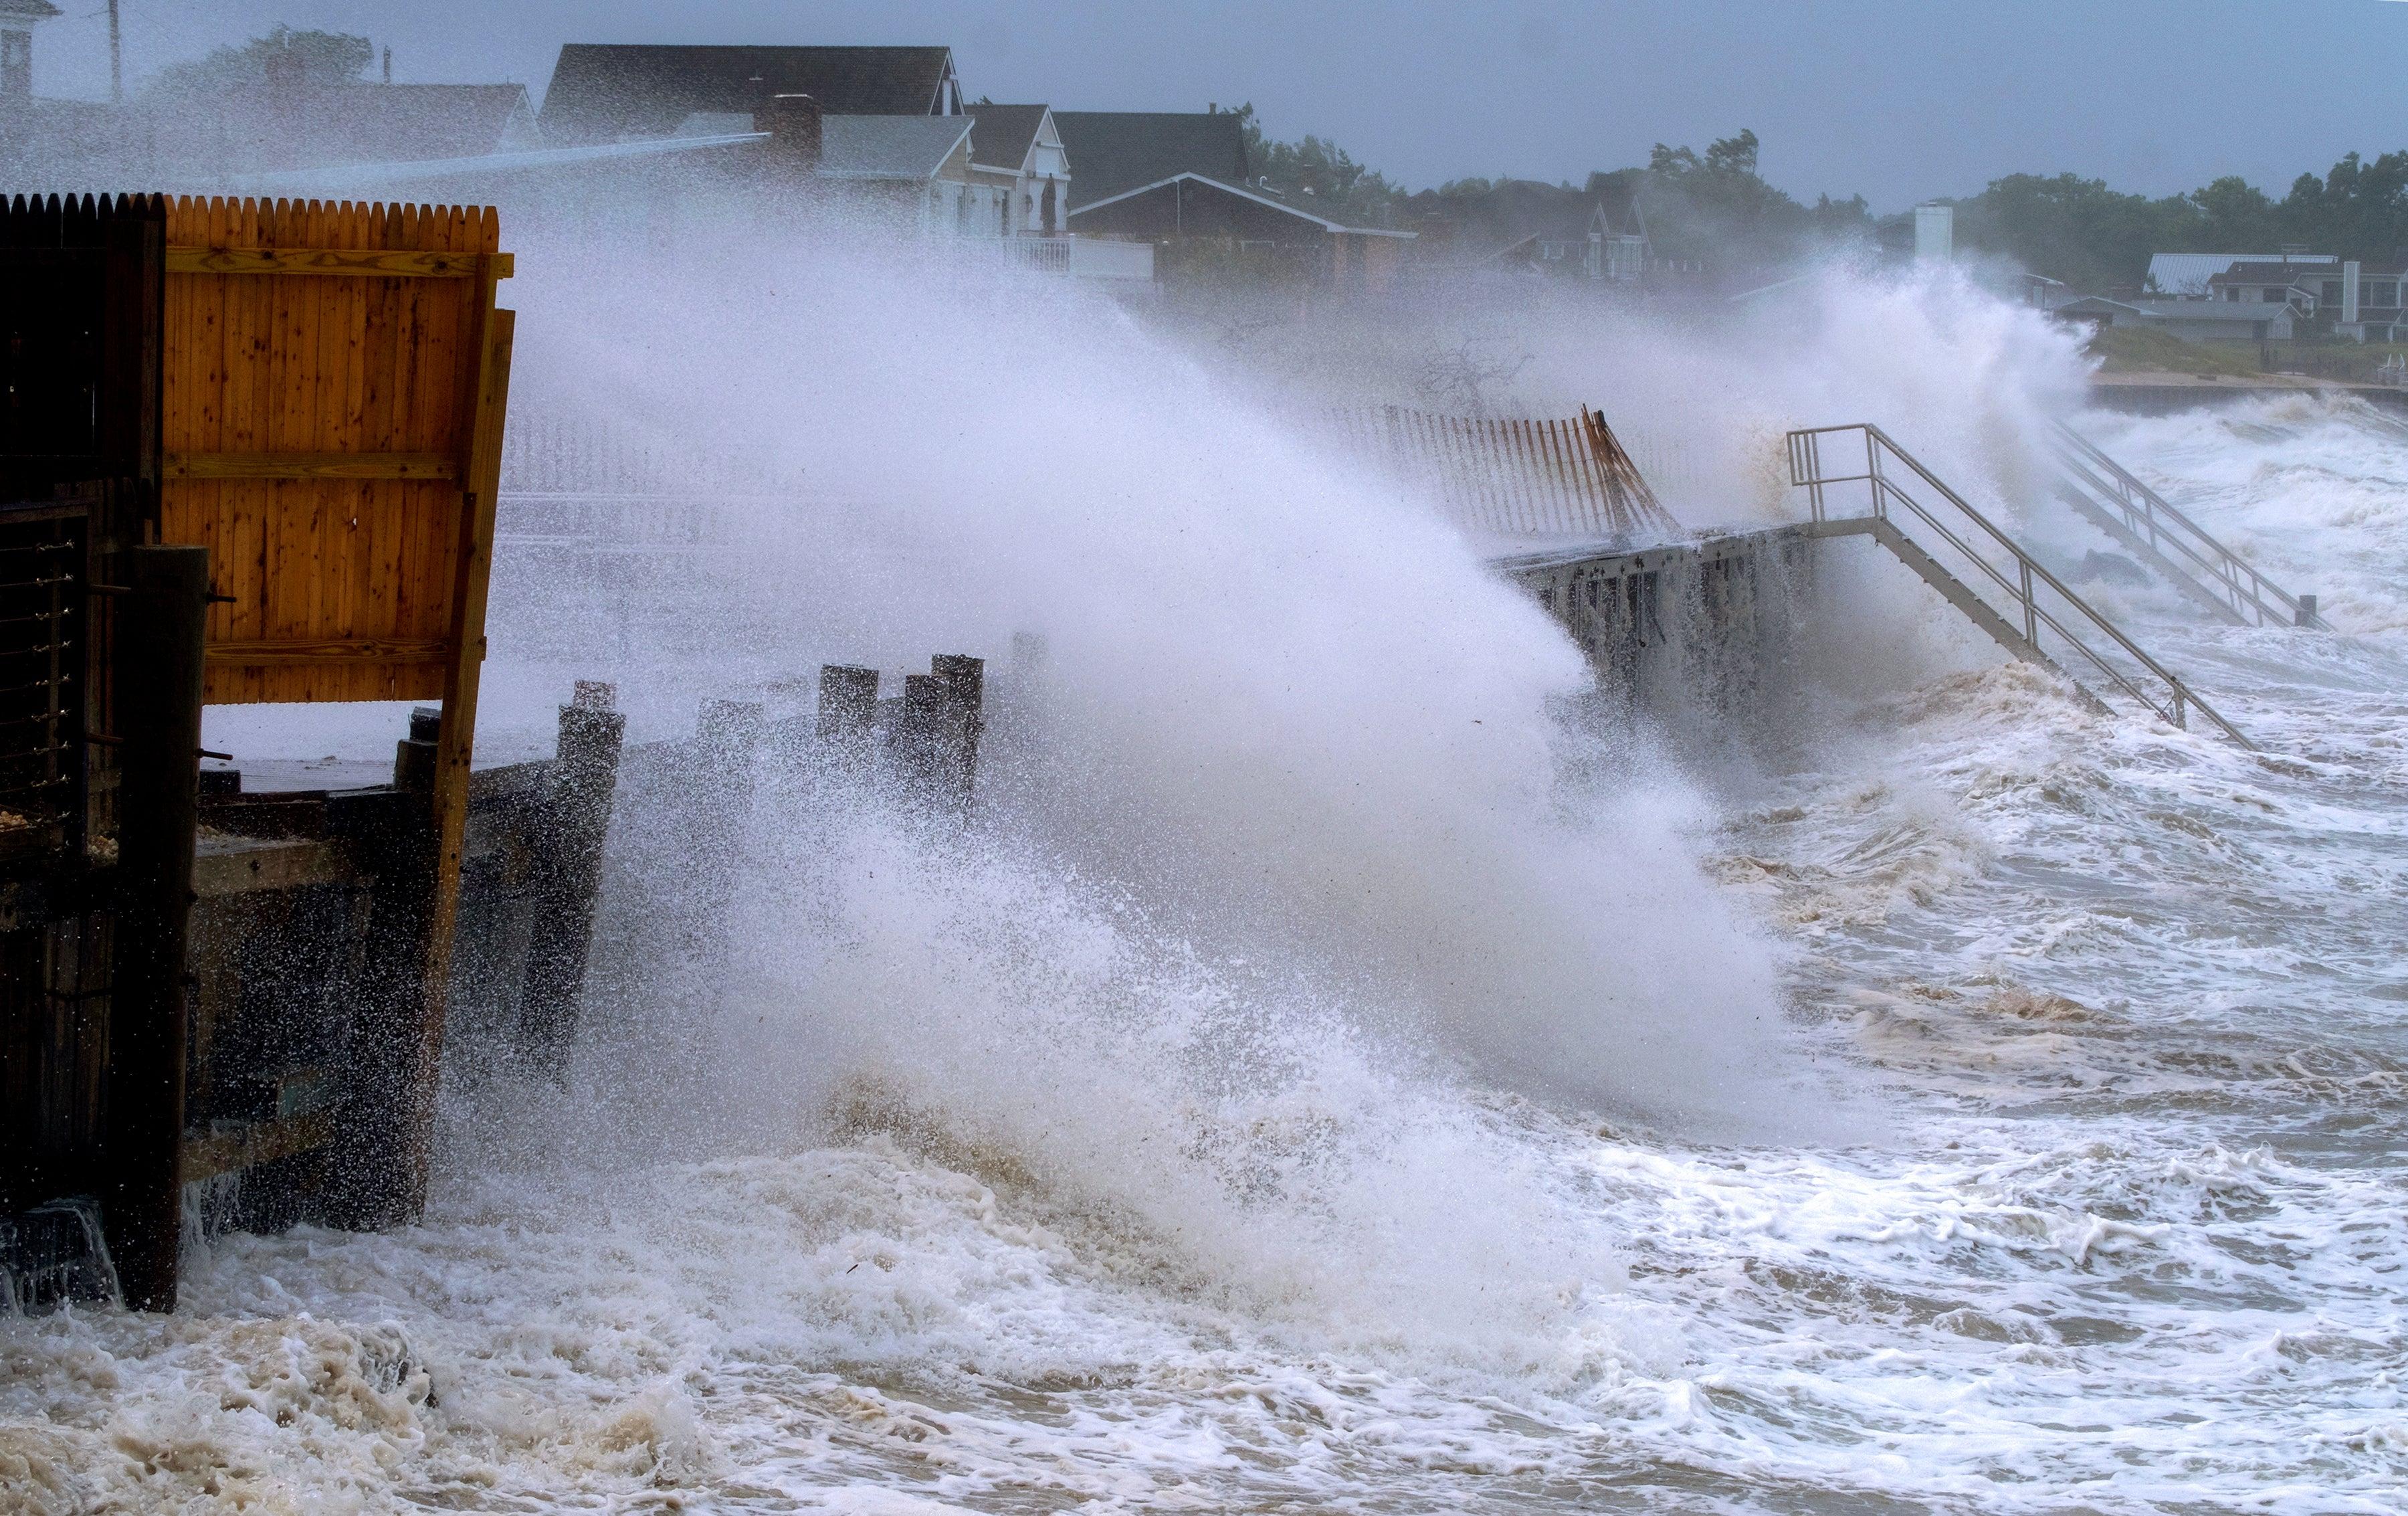 Tropical Storm Henri in Photos